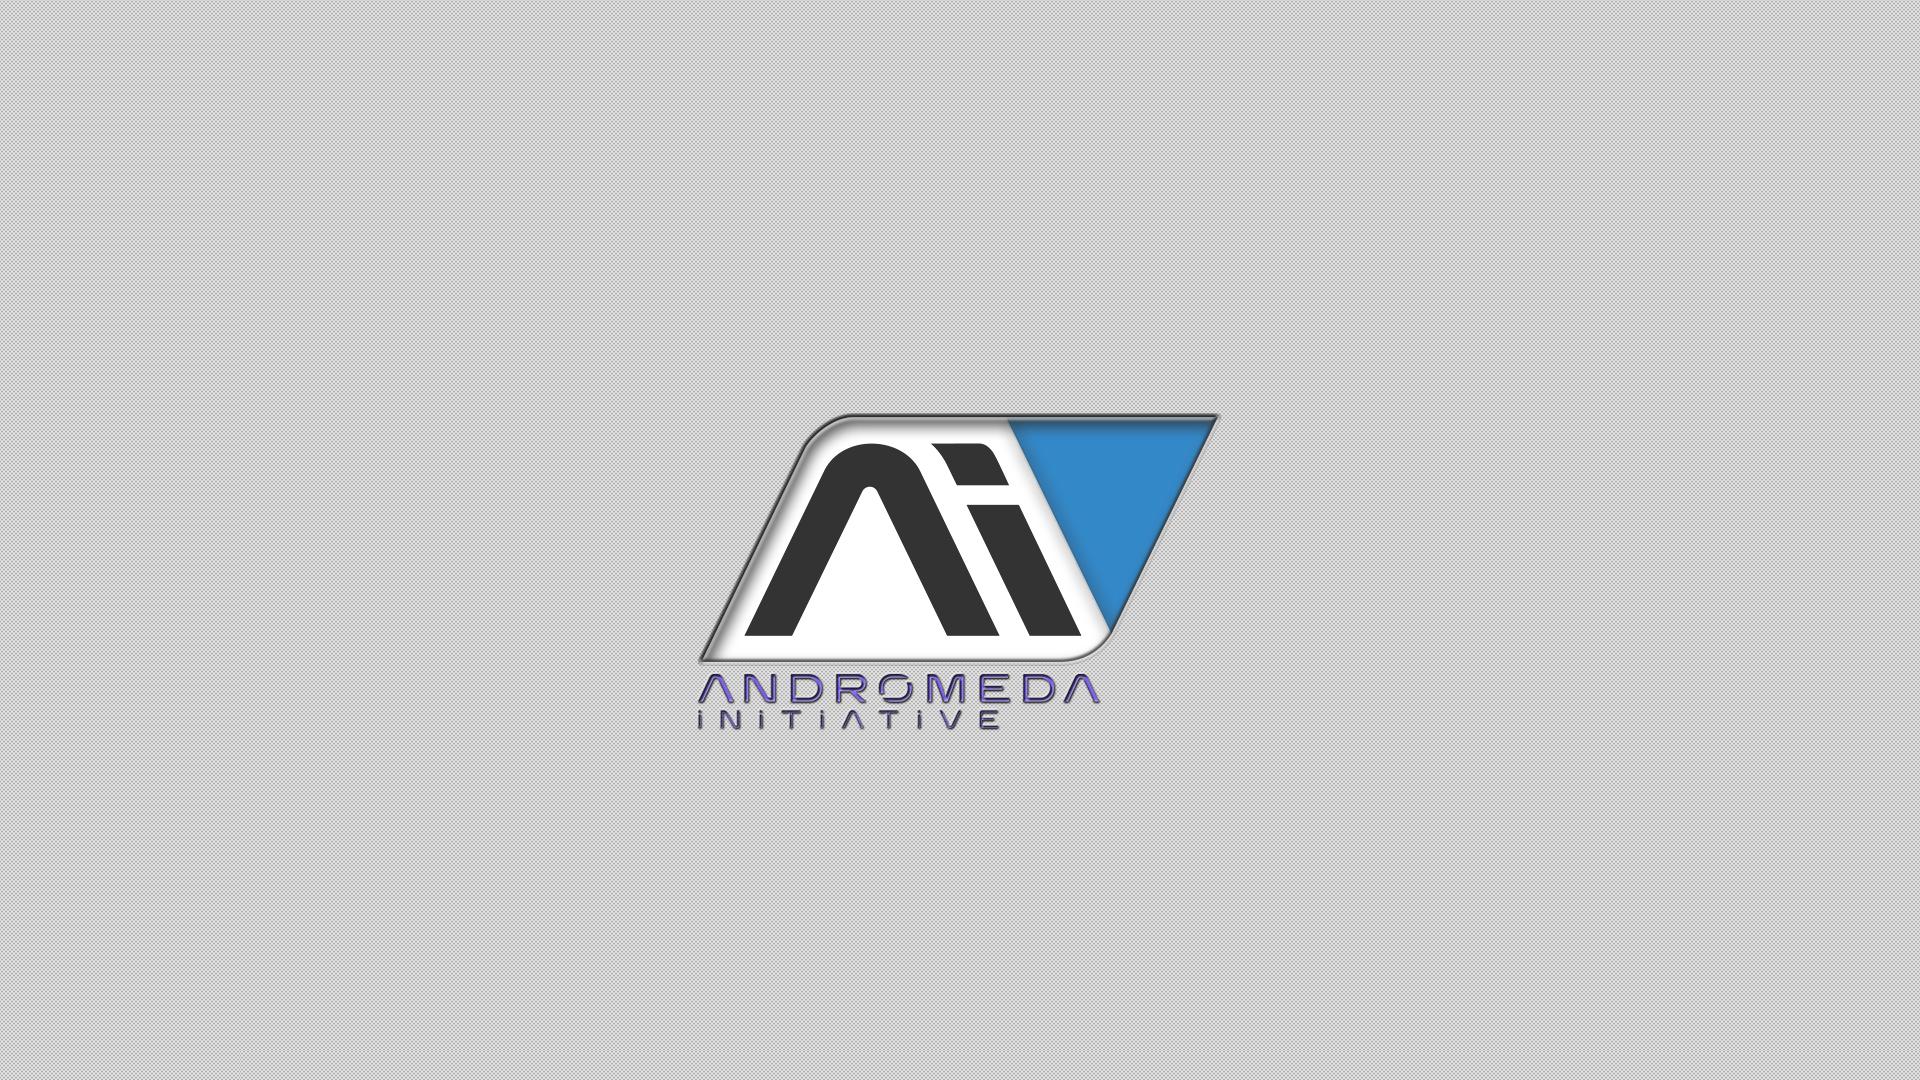 Andromeda Initiative Wallpaper 16 9 By Xsas7 On Deviantart